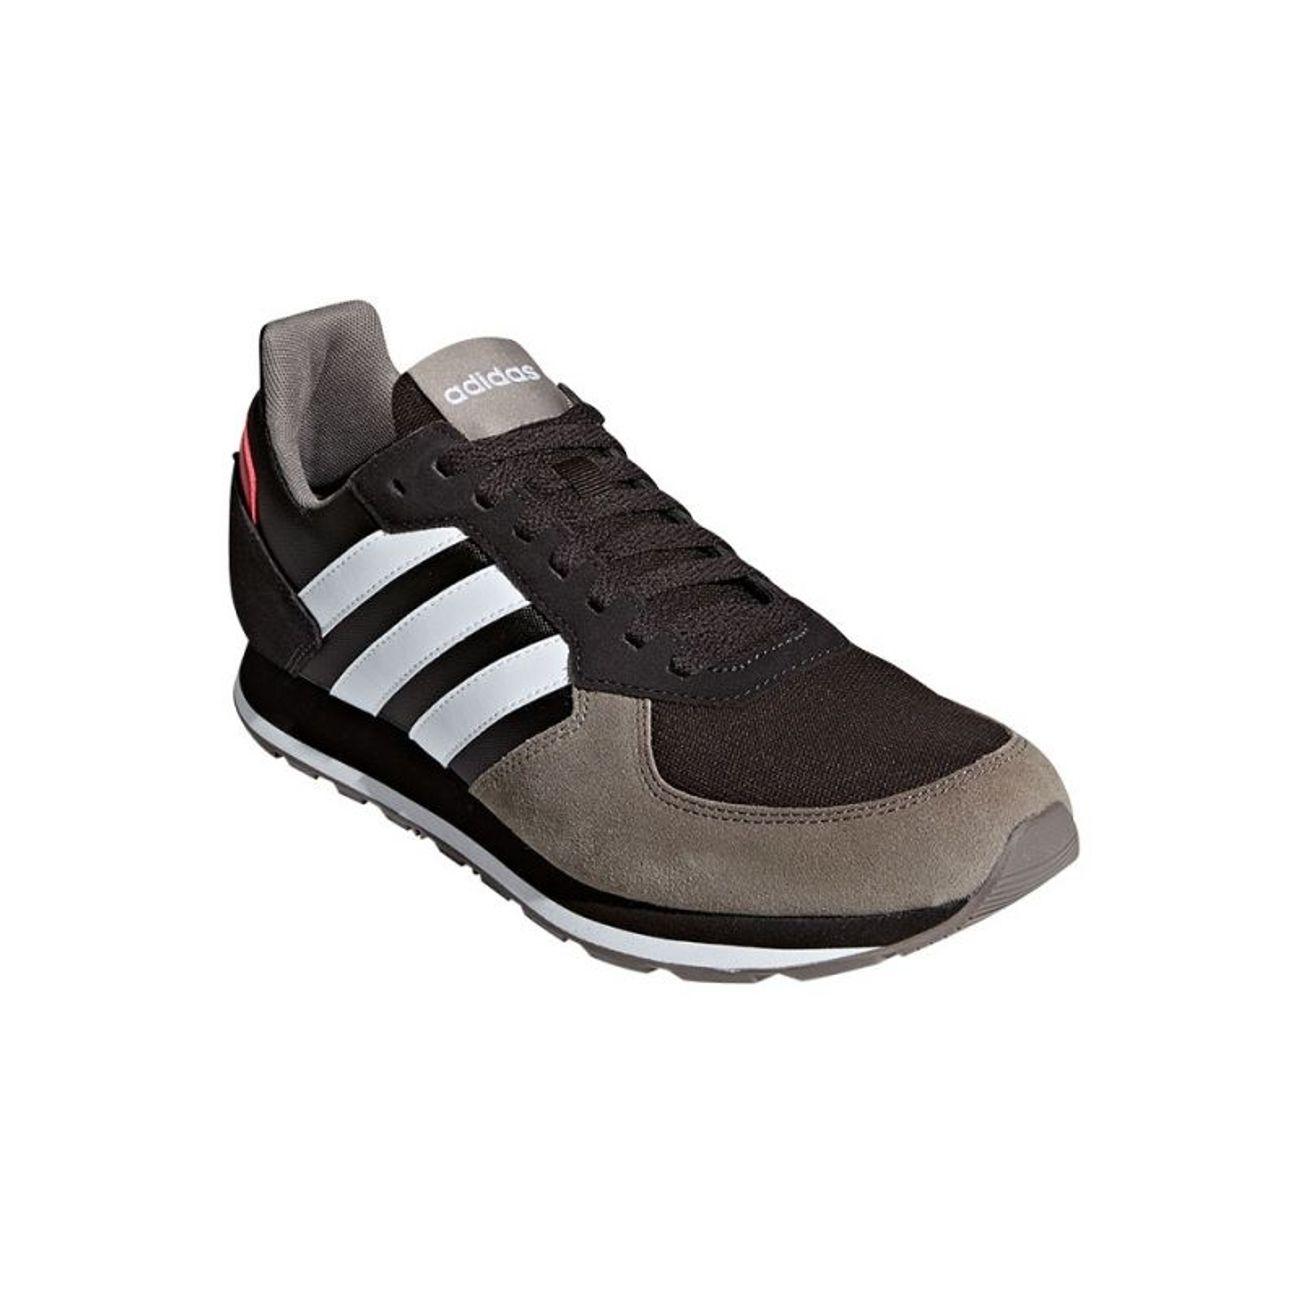 Adidas 8k Adidas Adidas Adulte 8k B44681 B44681 Padel Padel Adulte Adulte Padel EHIWD29Y